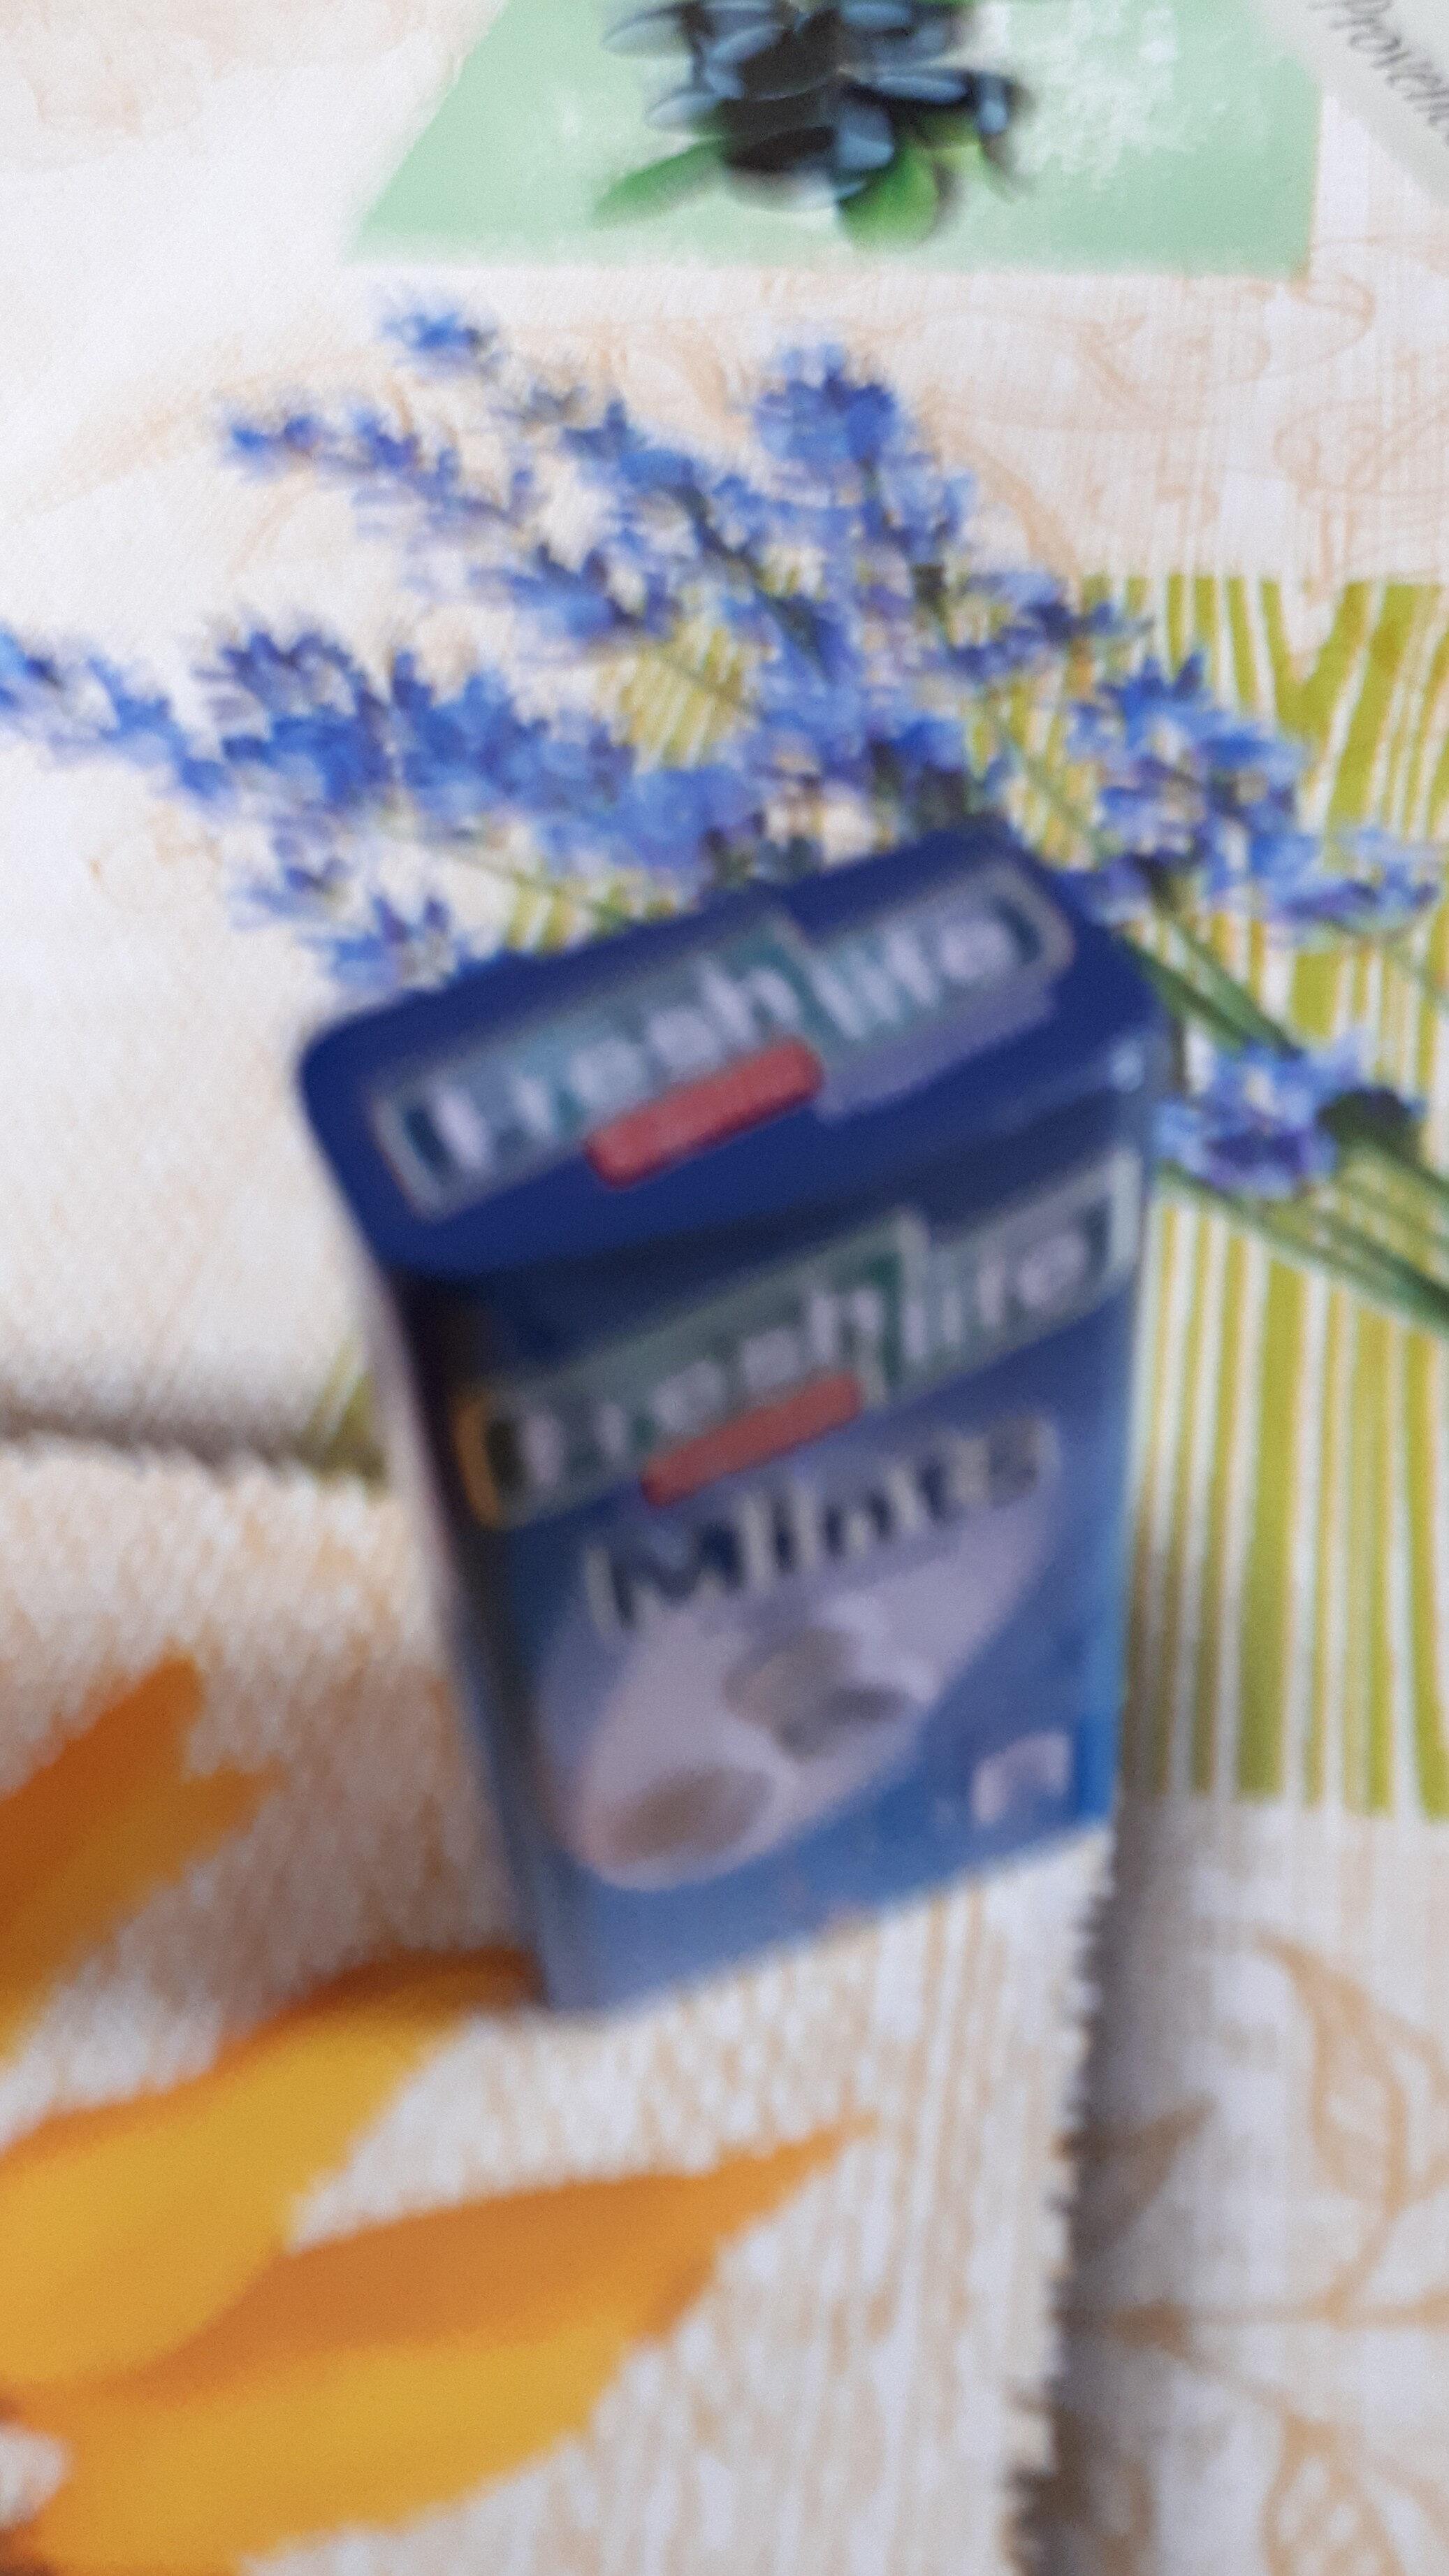 Mints peppermint - Product - fr